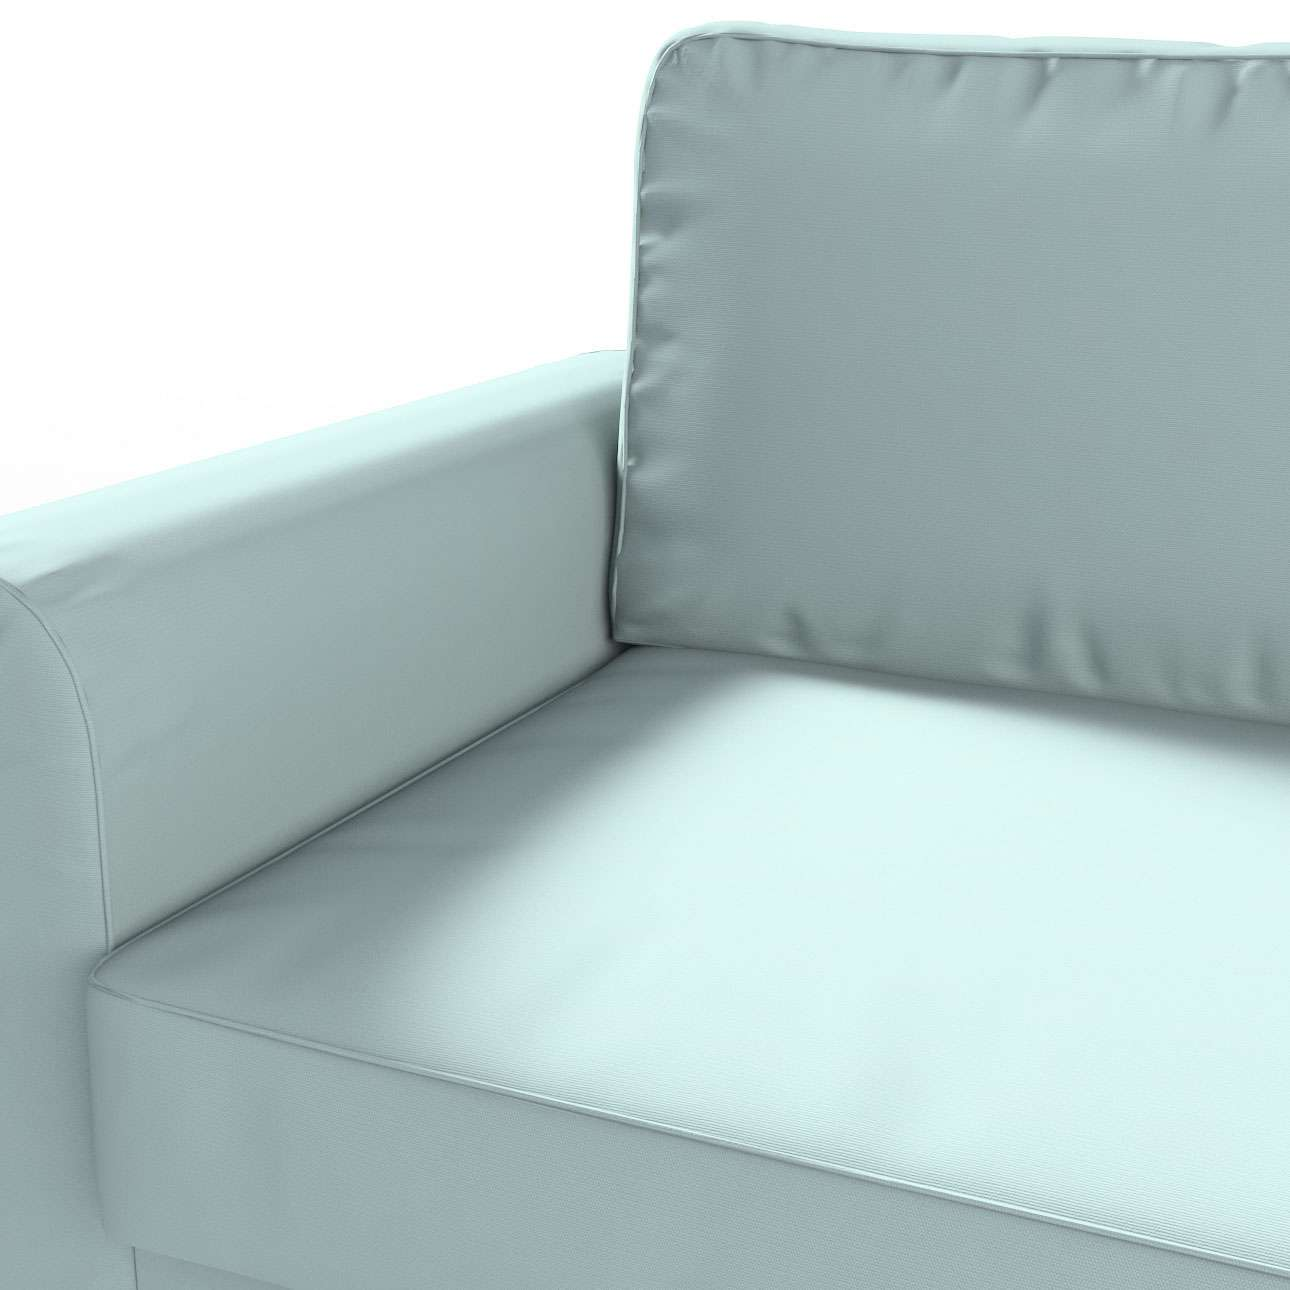 backabro 3 sitzer sofabezug ausklappbar hellblau dekoria. Black Bedroom Furniture Sets. Home Design Ideas